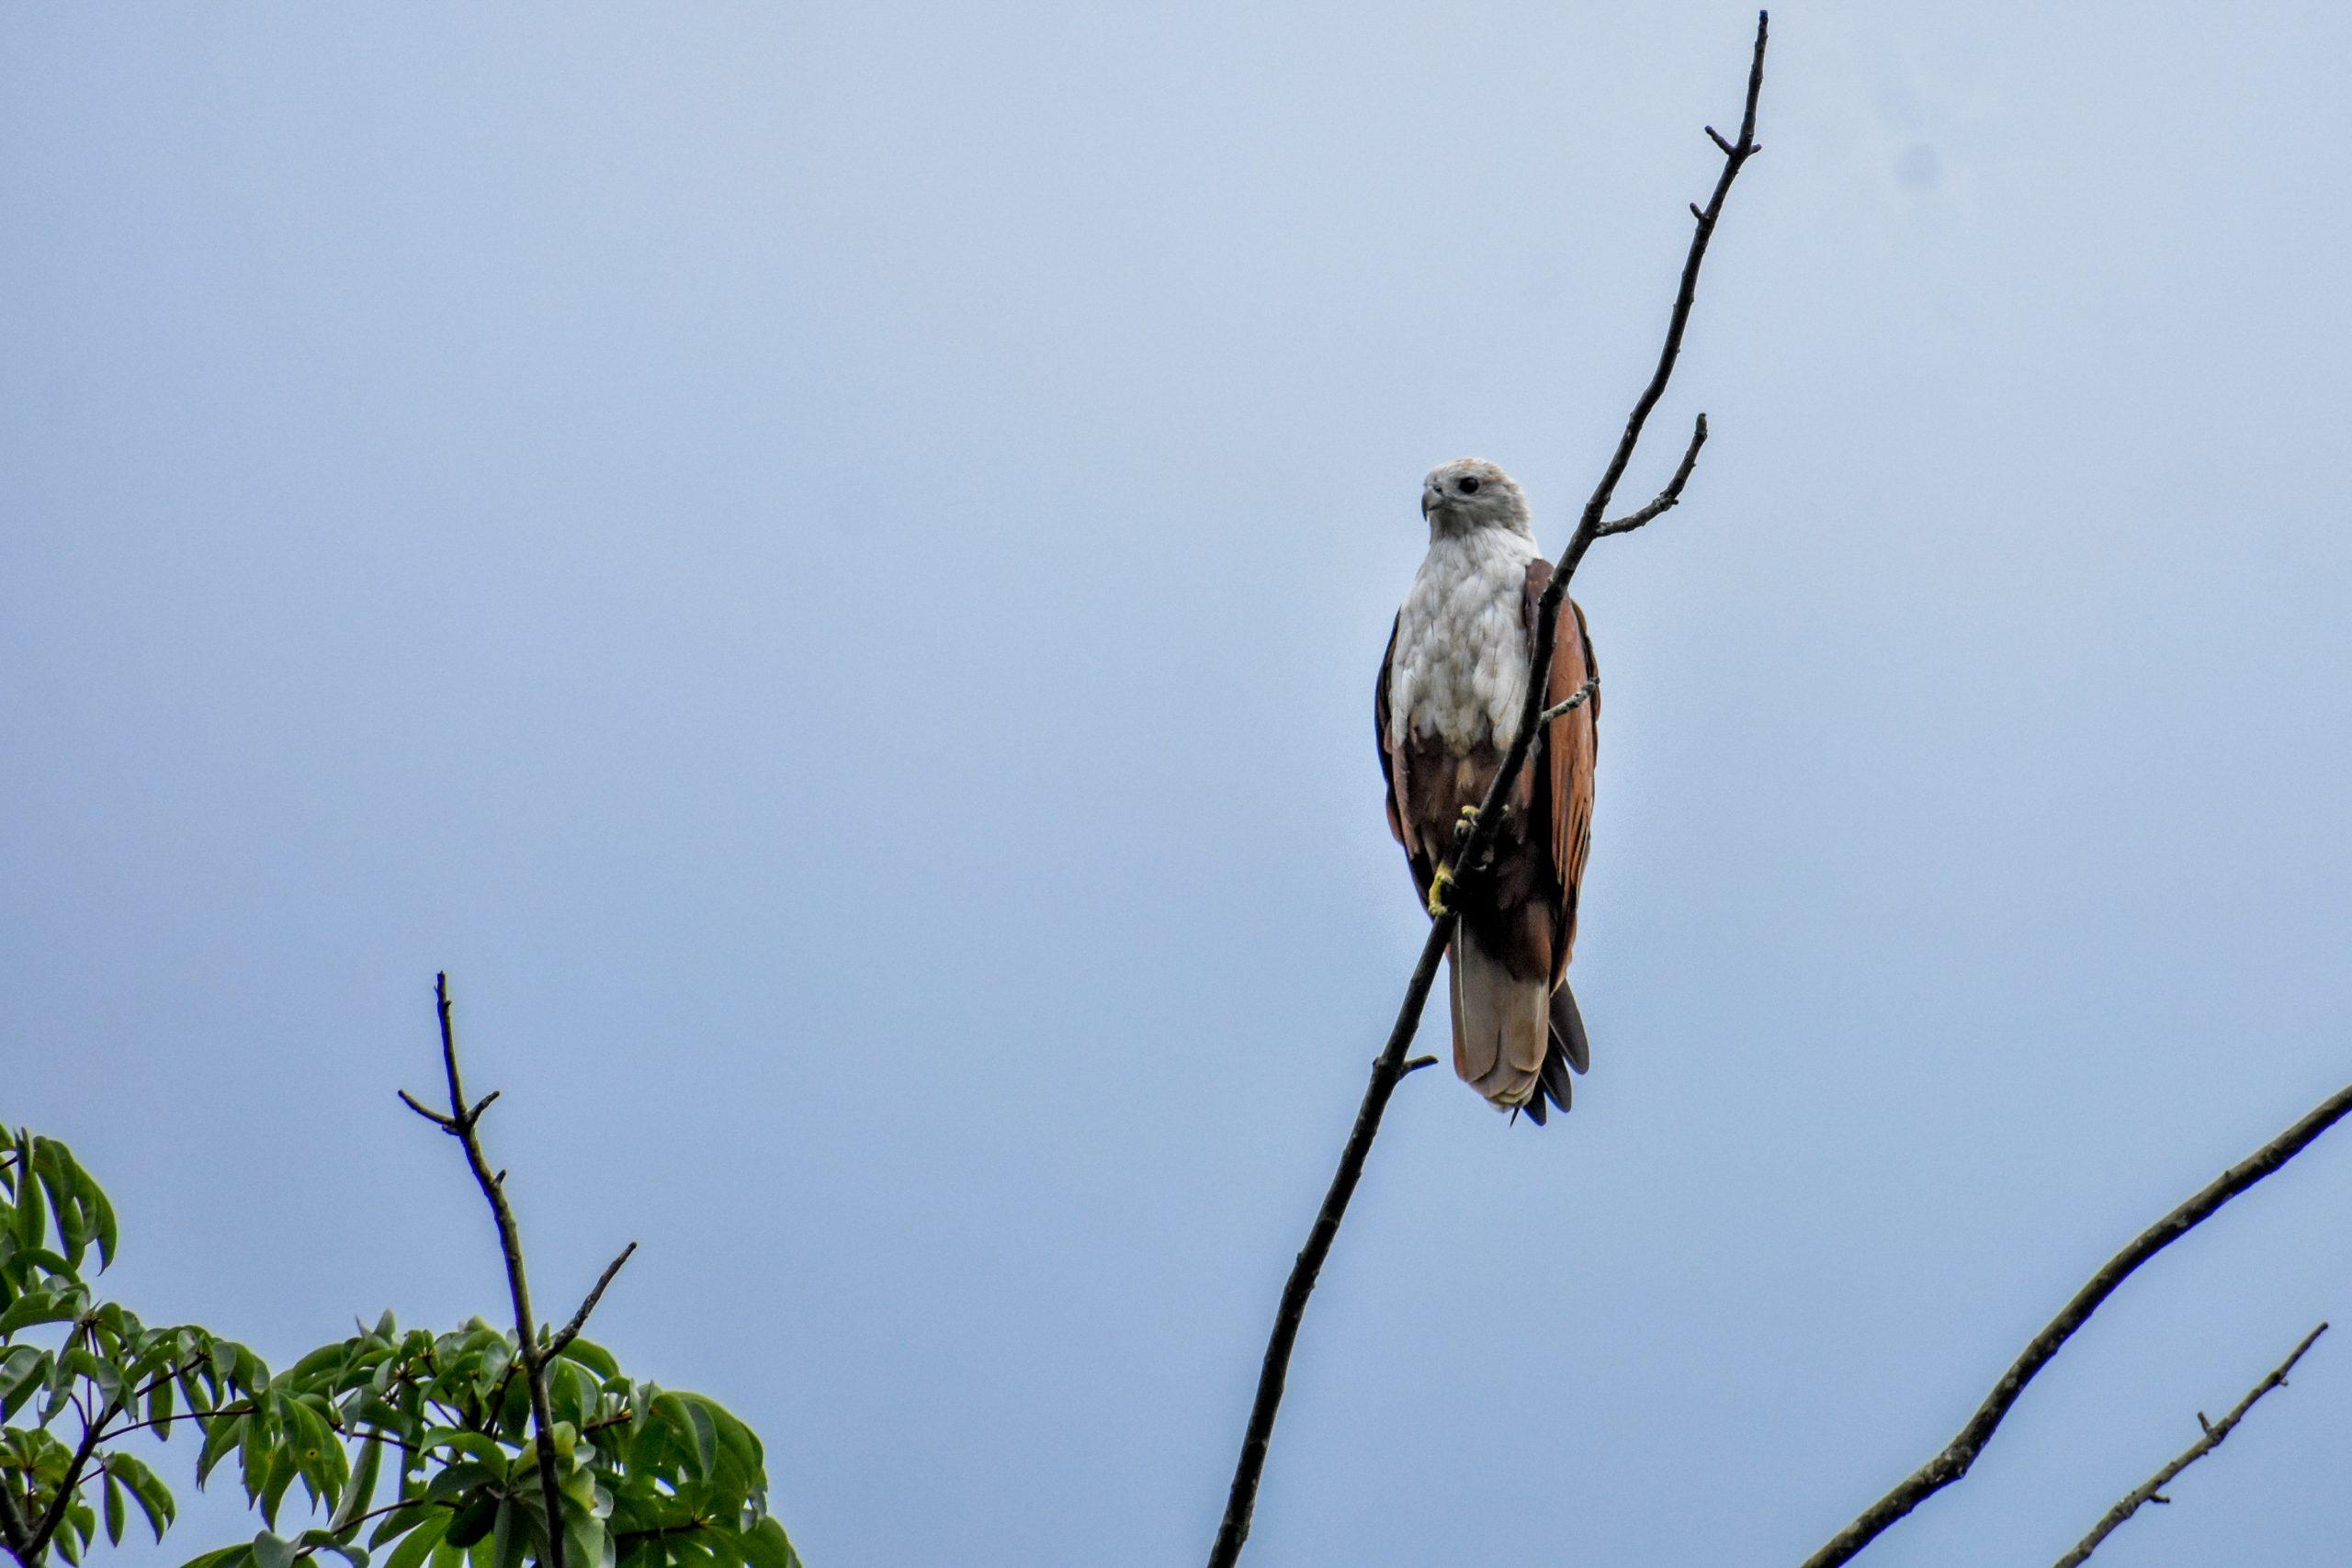 Eagle sitting on branch